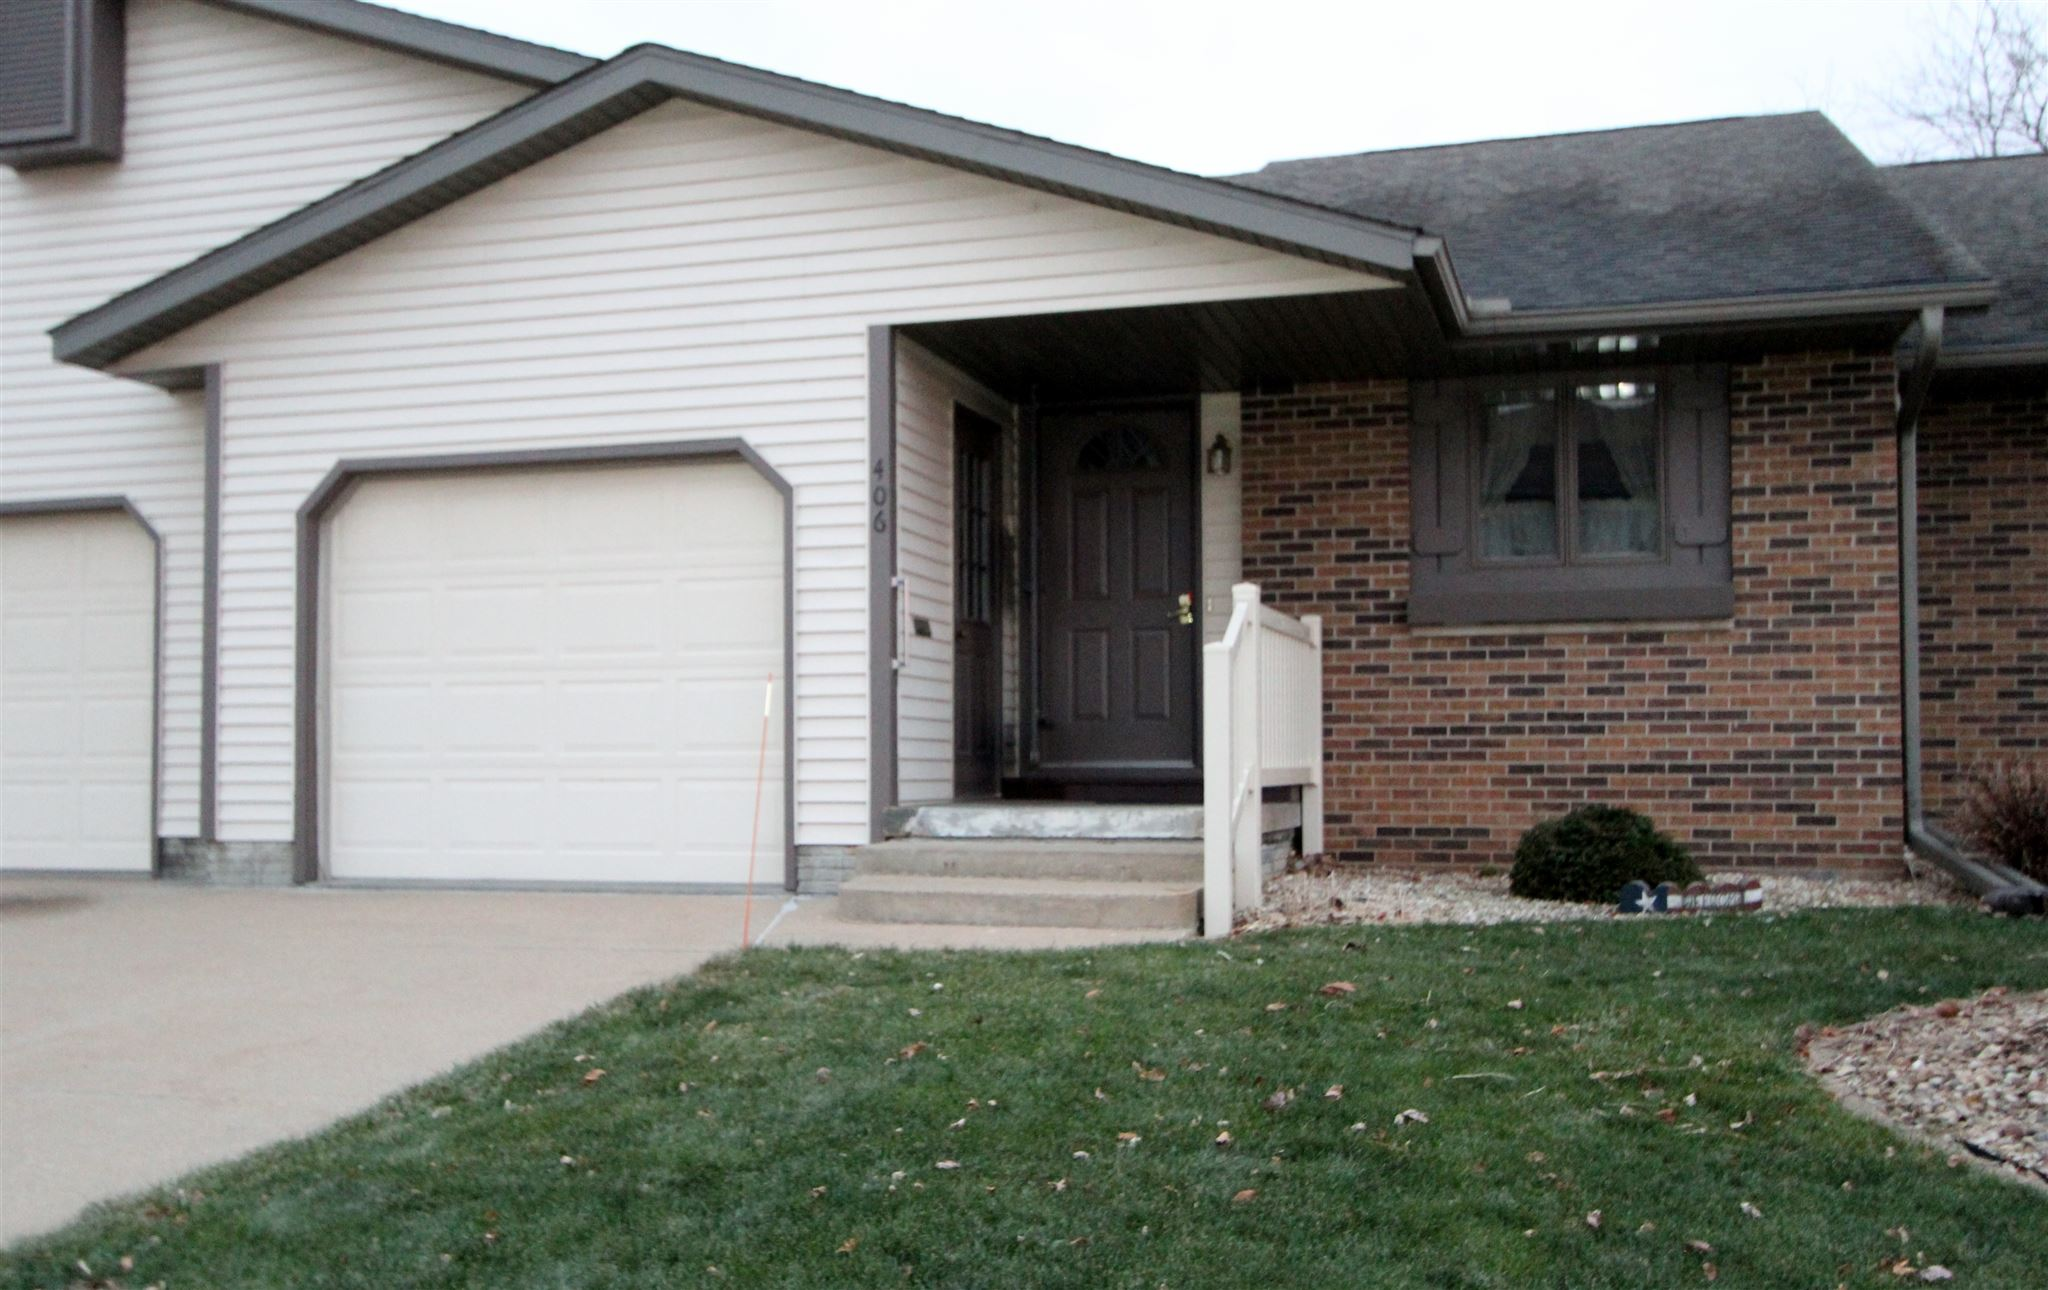 406 9TH Property Photo - Fulton, IL real estate listing